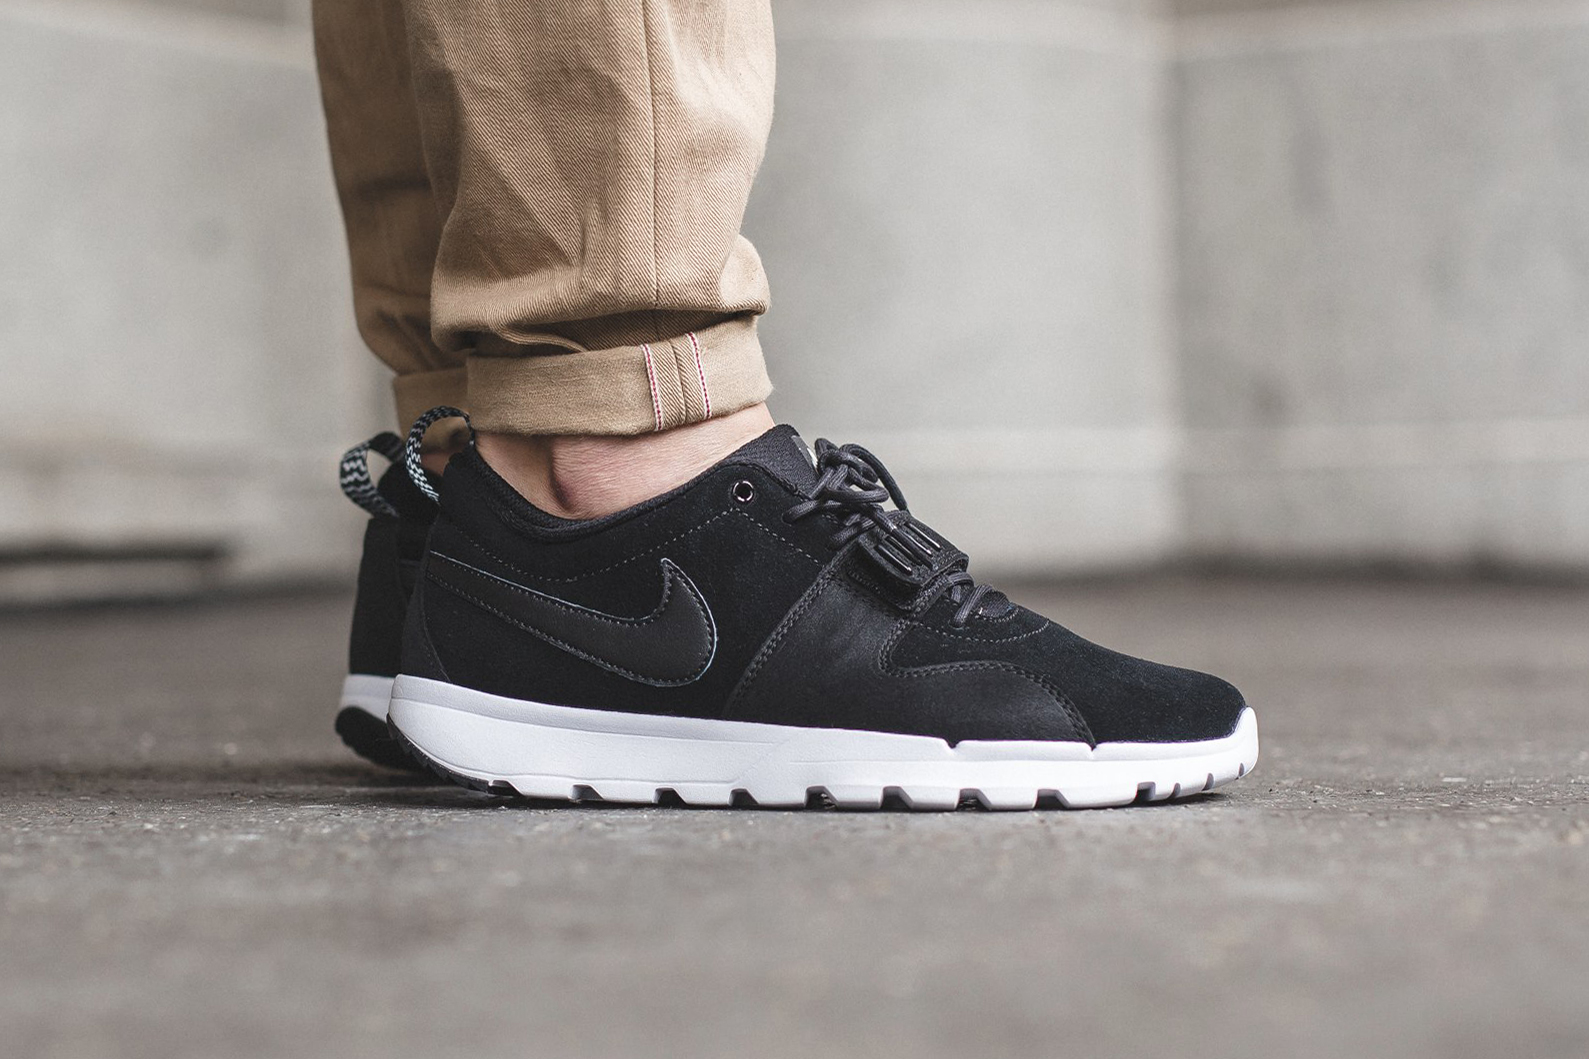 Nike SB Trainerendor Black/Black-White